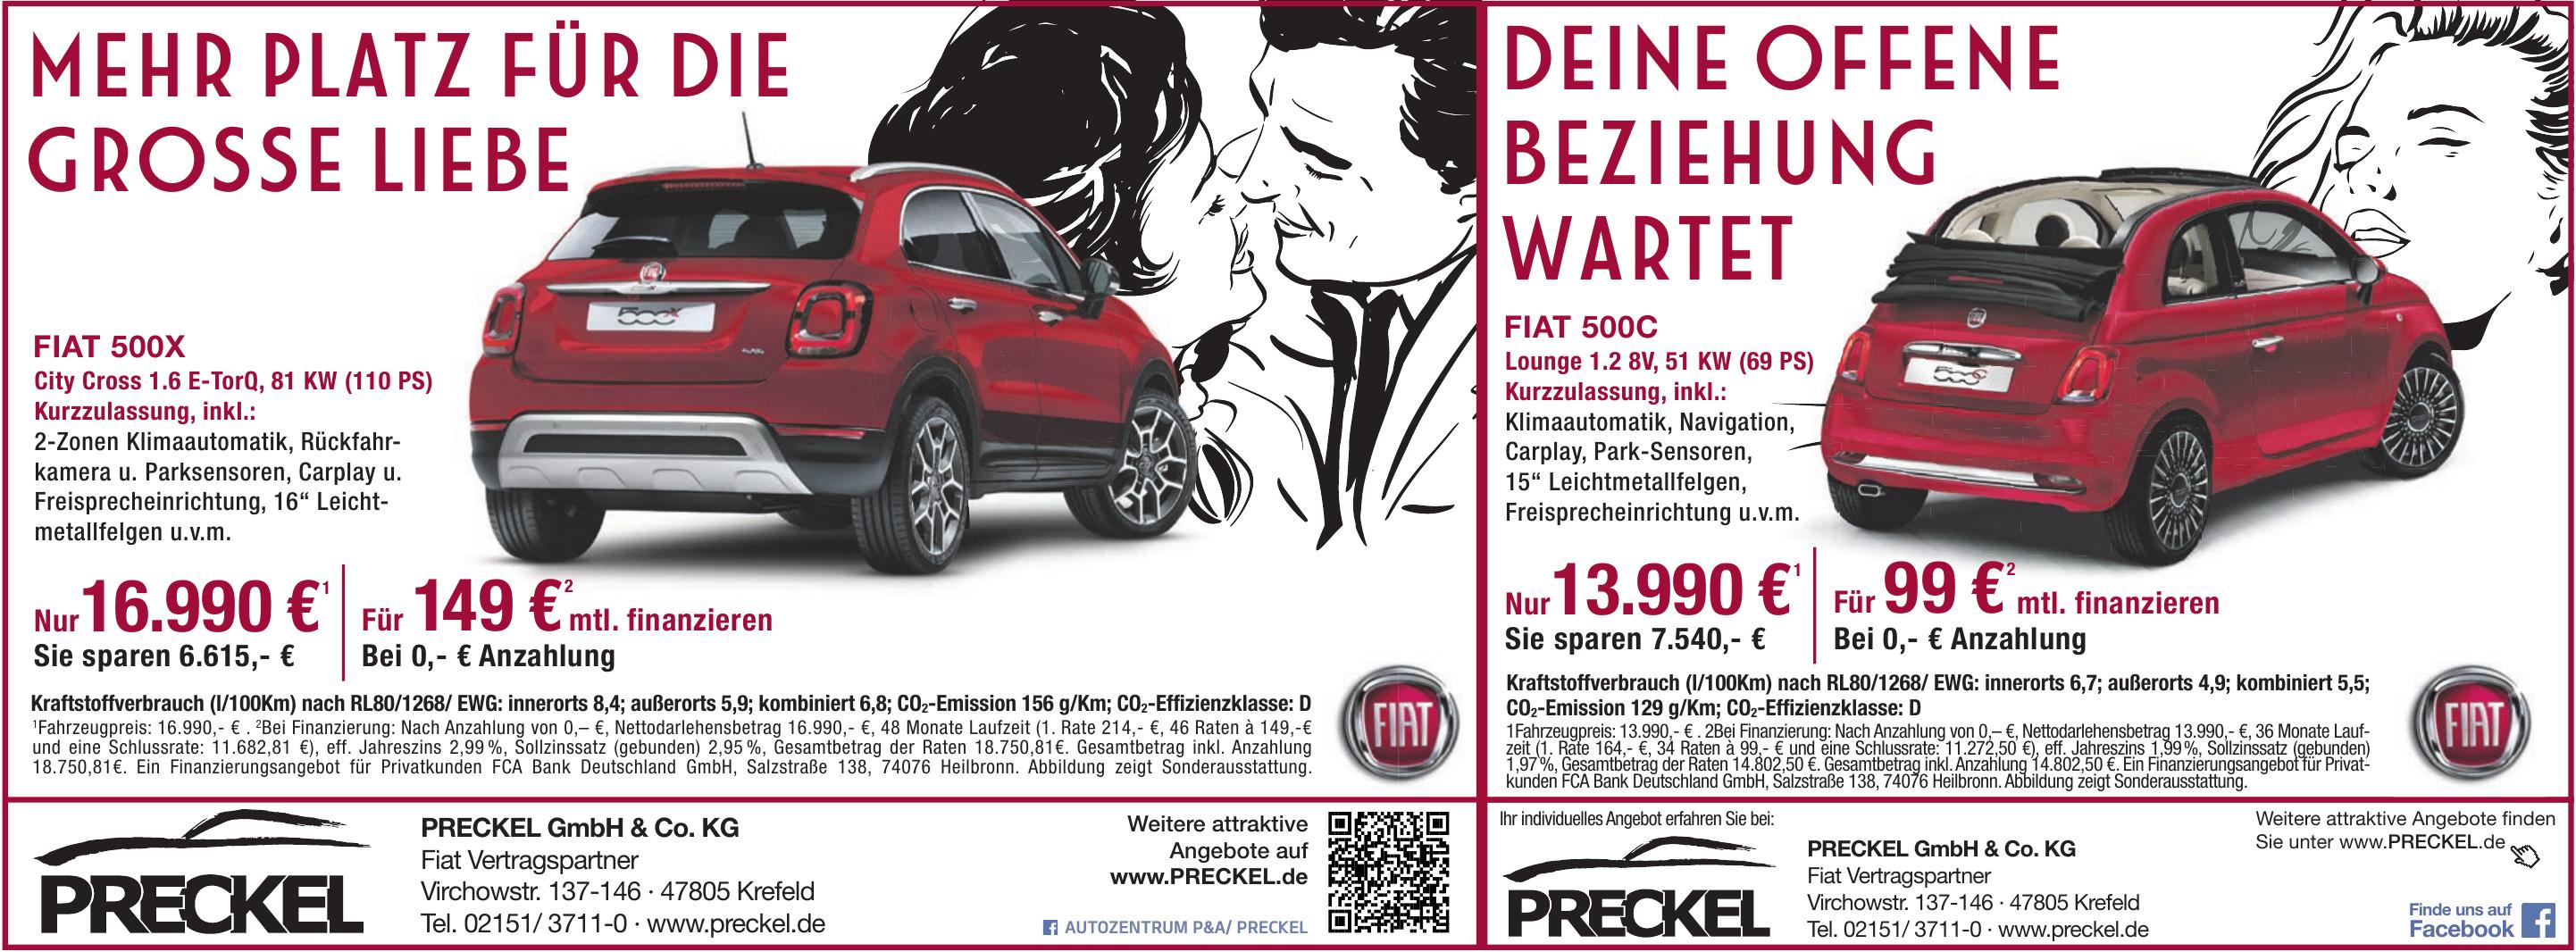 Preckel GmbH & Co. KG